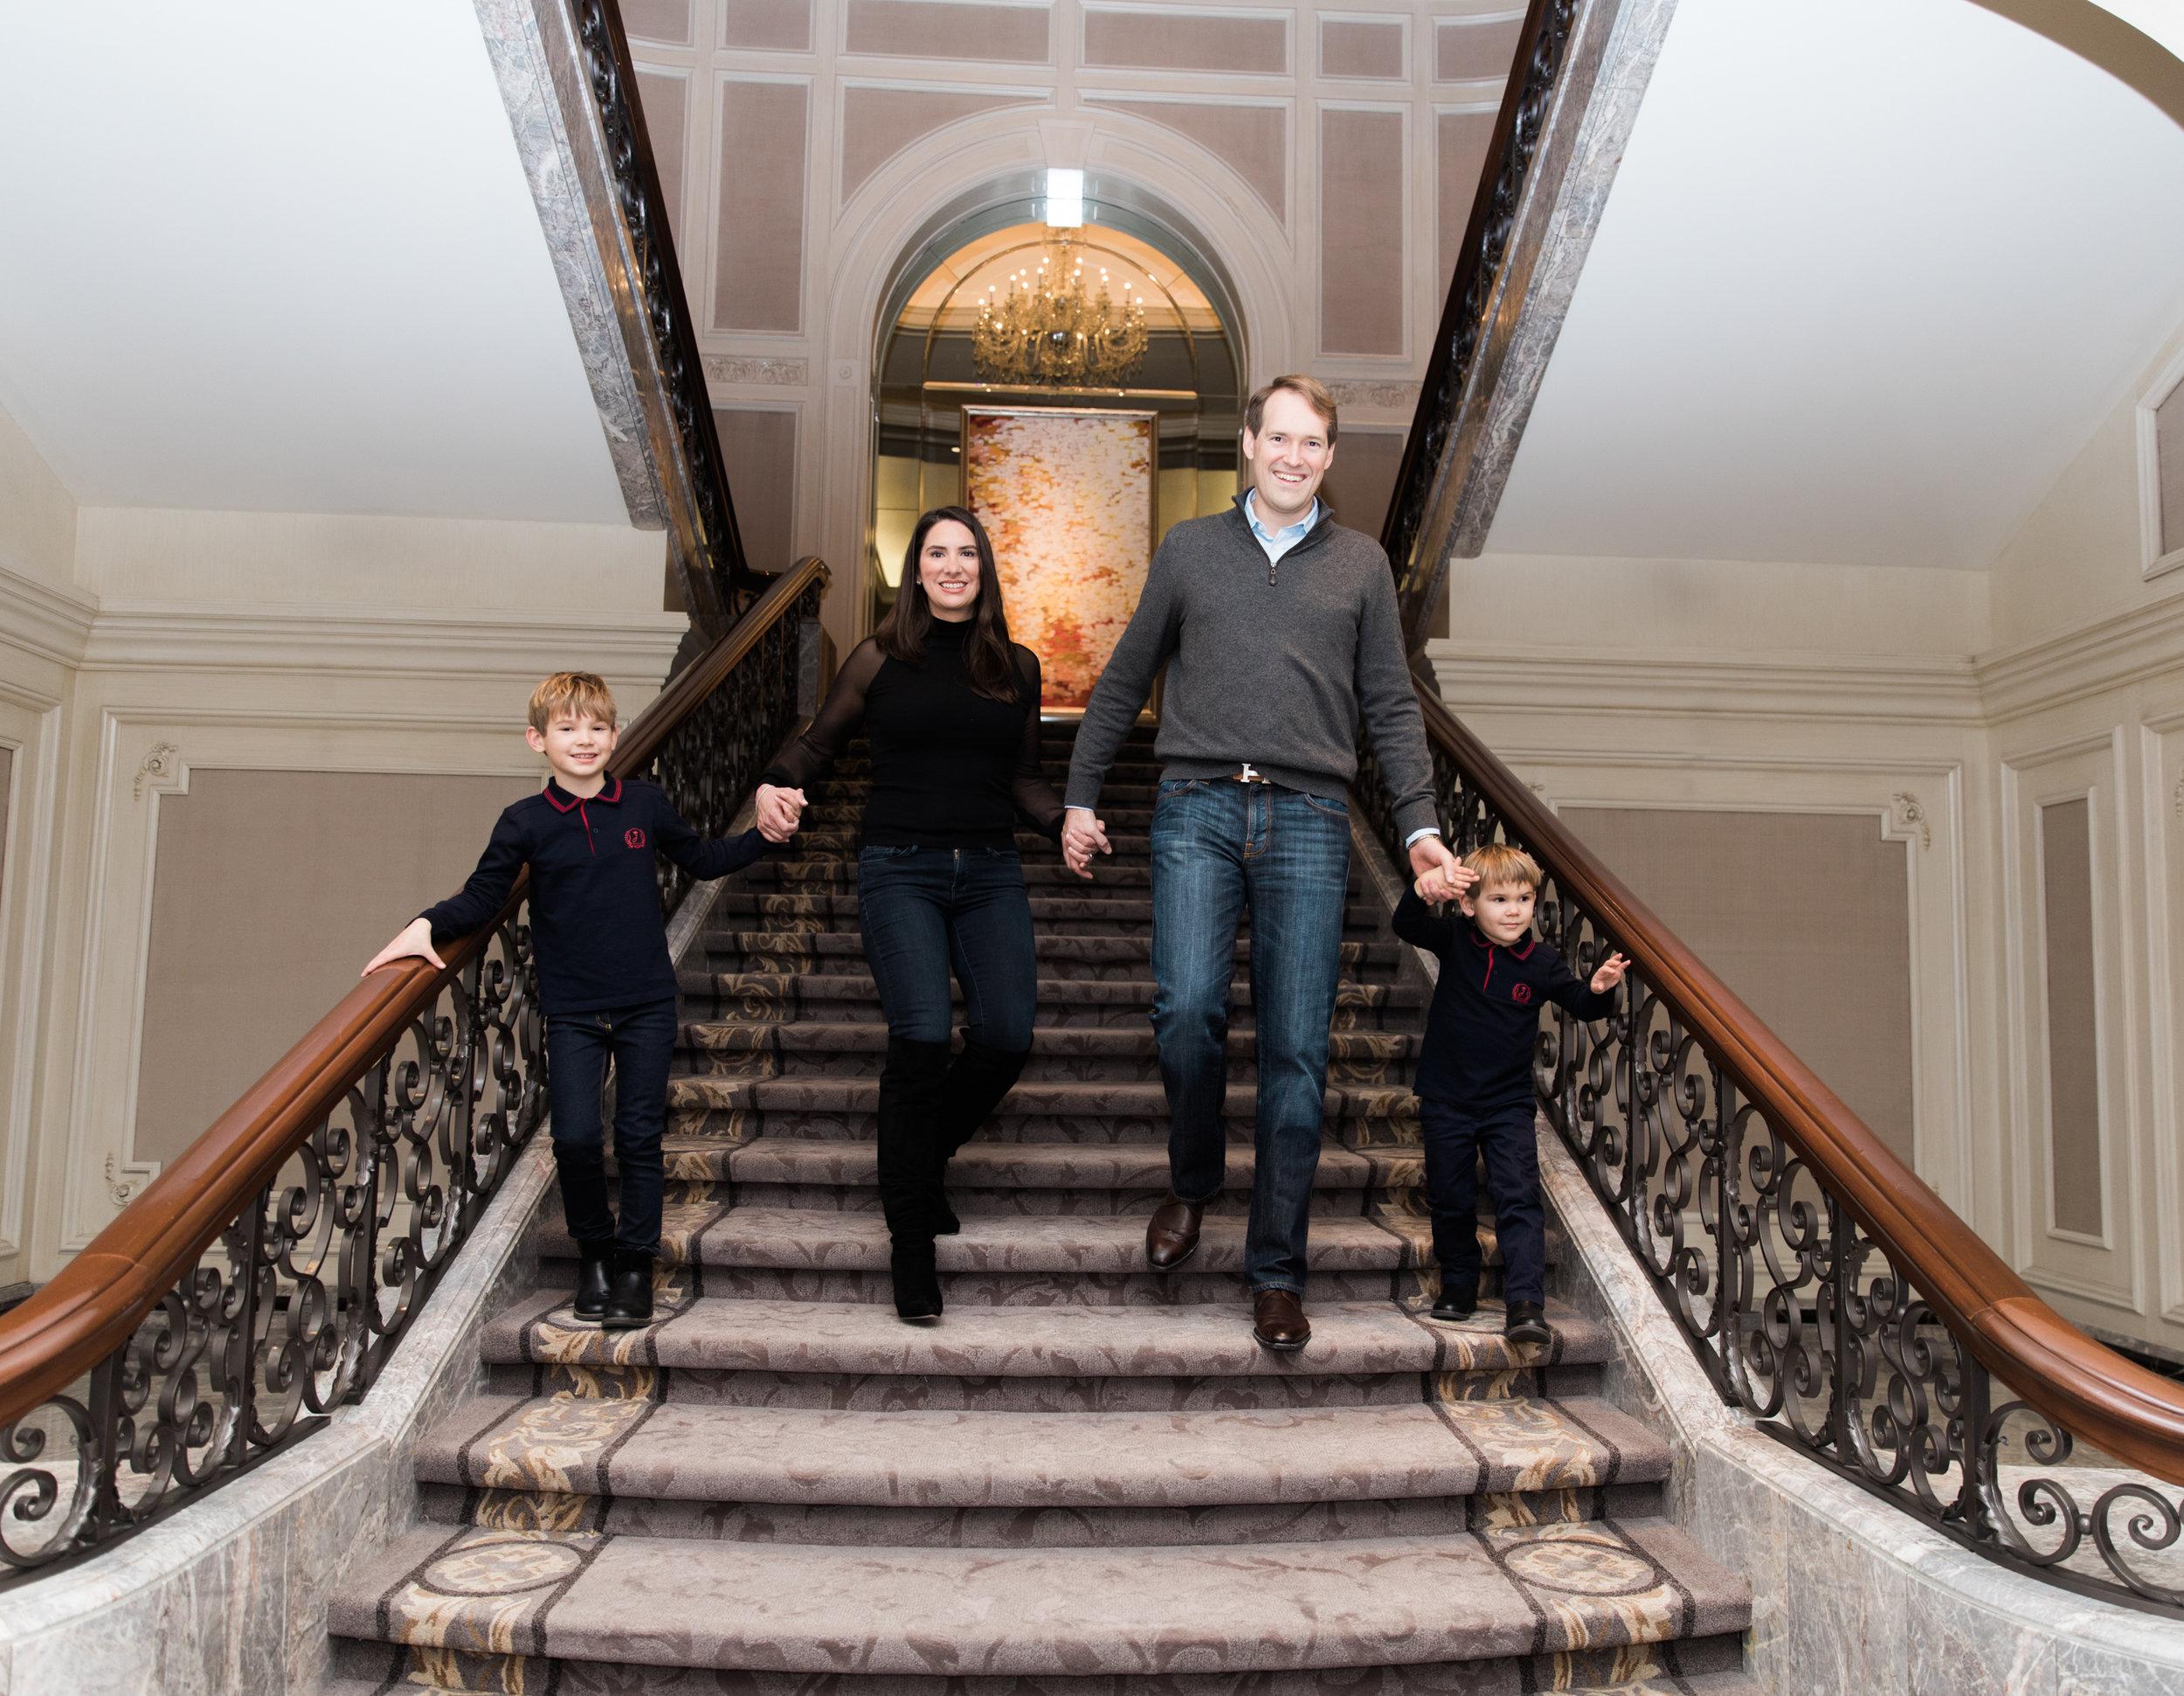 Bonphotage Chicago Fine Art Family Photography